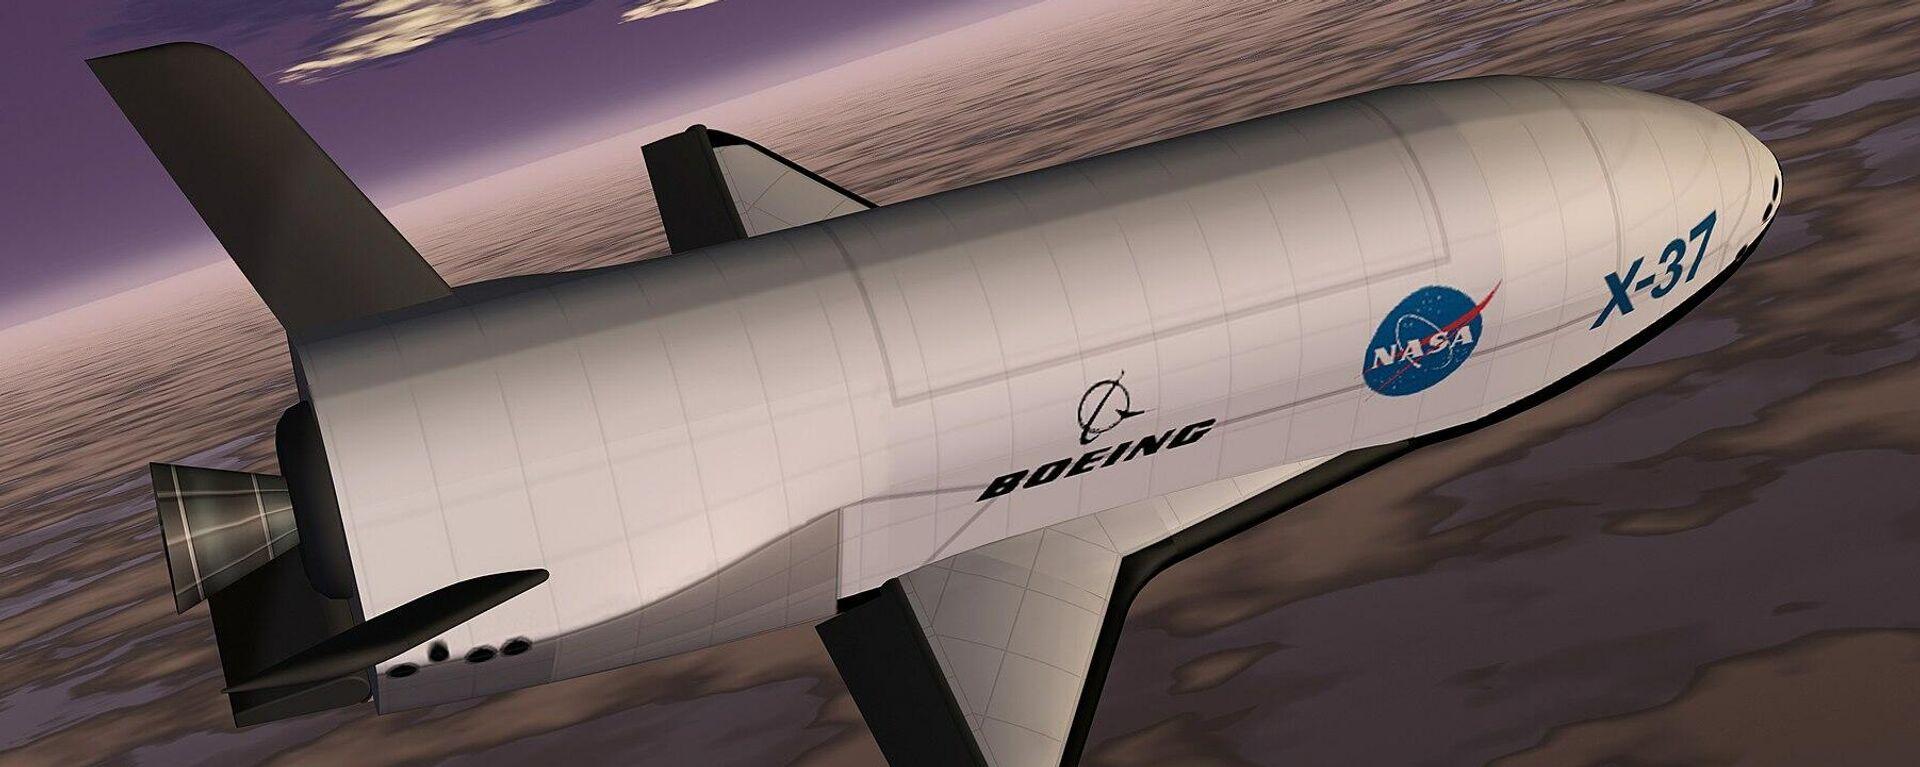 Raumgleiter X-37 - SNA, 1920, 24.09.2021